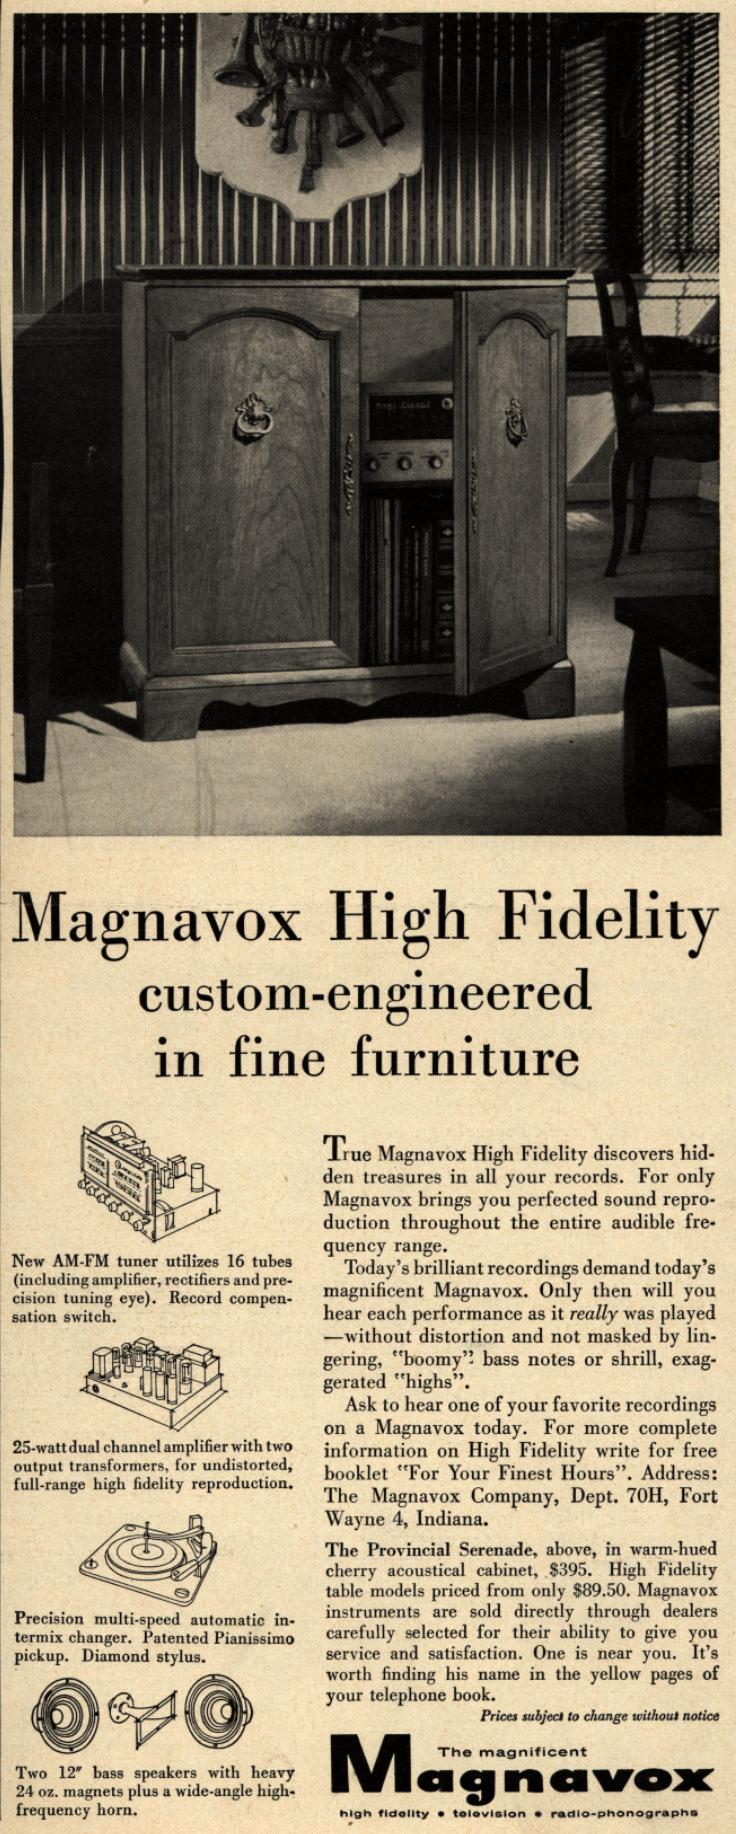 Magnavox_High_Fidelity_Custom-Engineered_in_Fine_Furniture